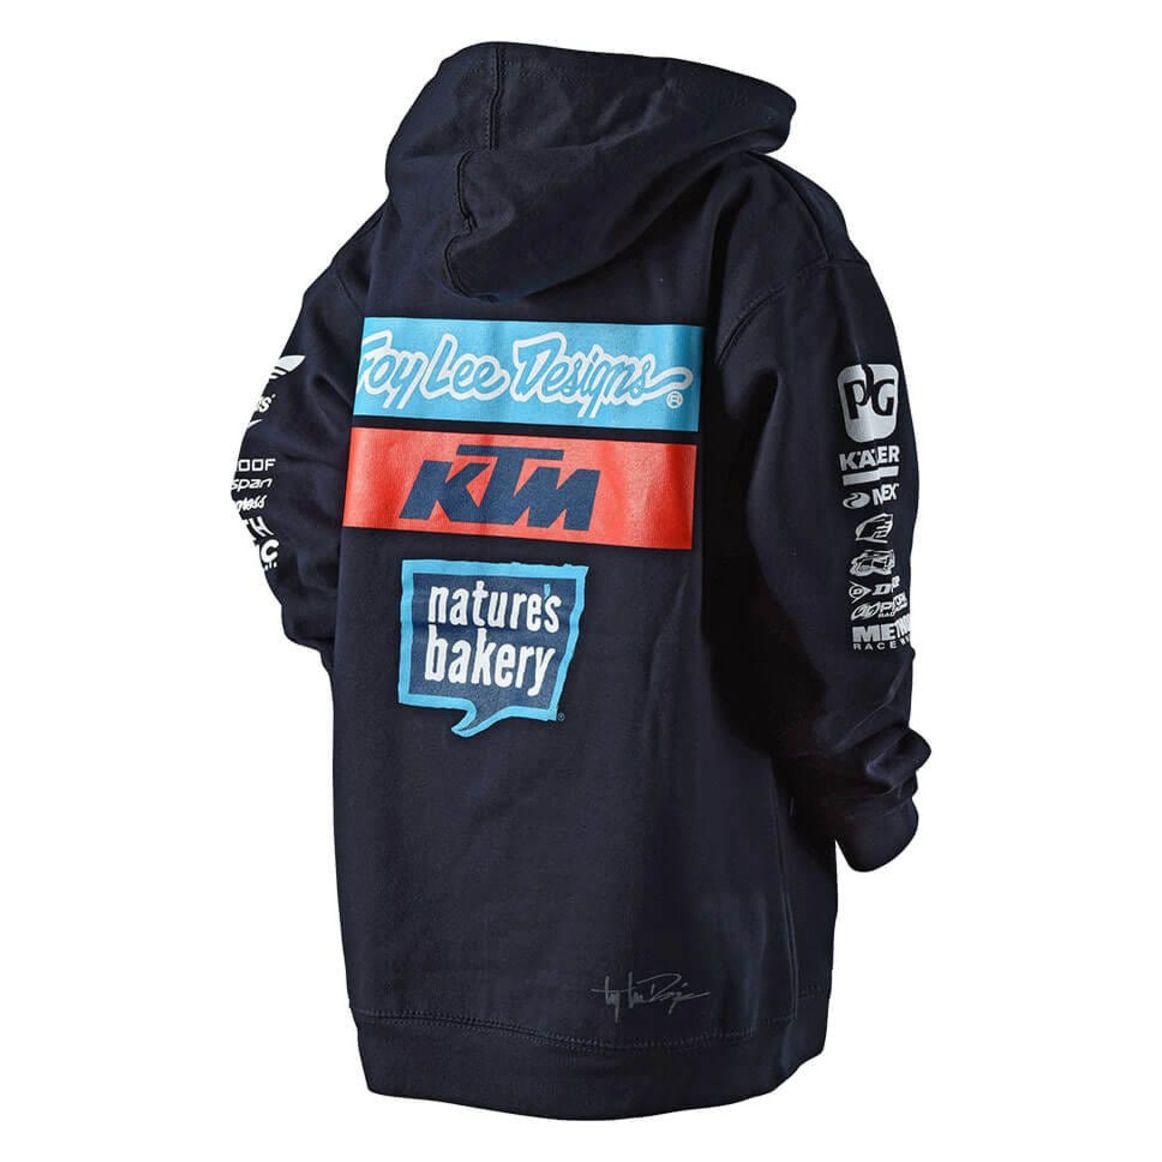 39bb8b1a5f02a Sweat TroyLee design TLD KTM TEAM YOUTH PULLOVER FLEECE NAVY ...